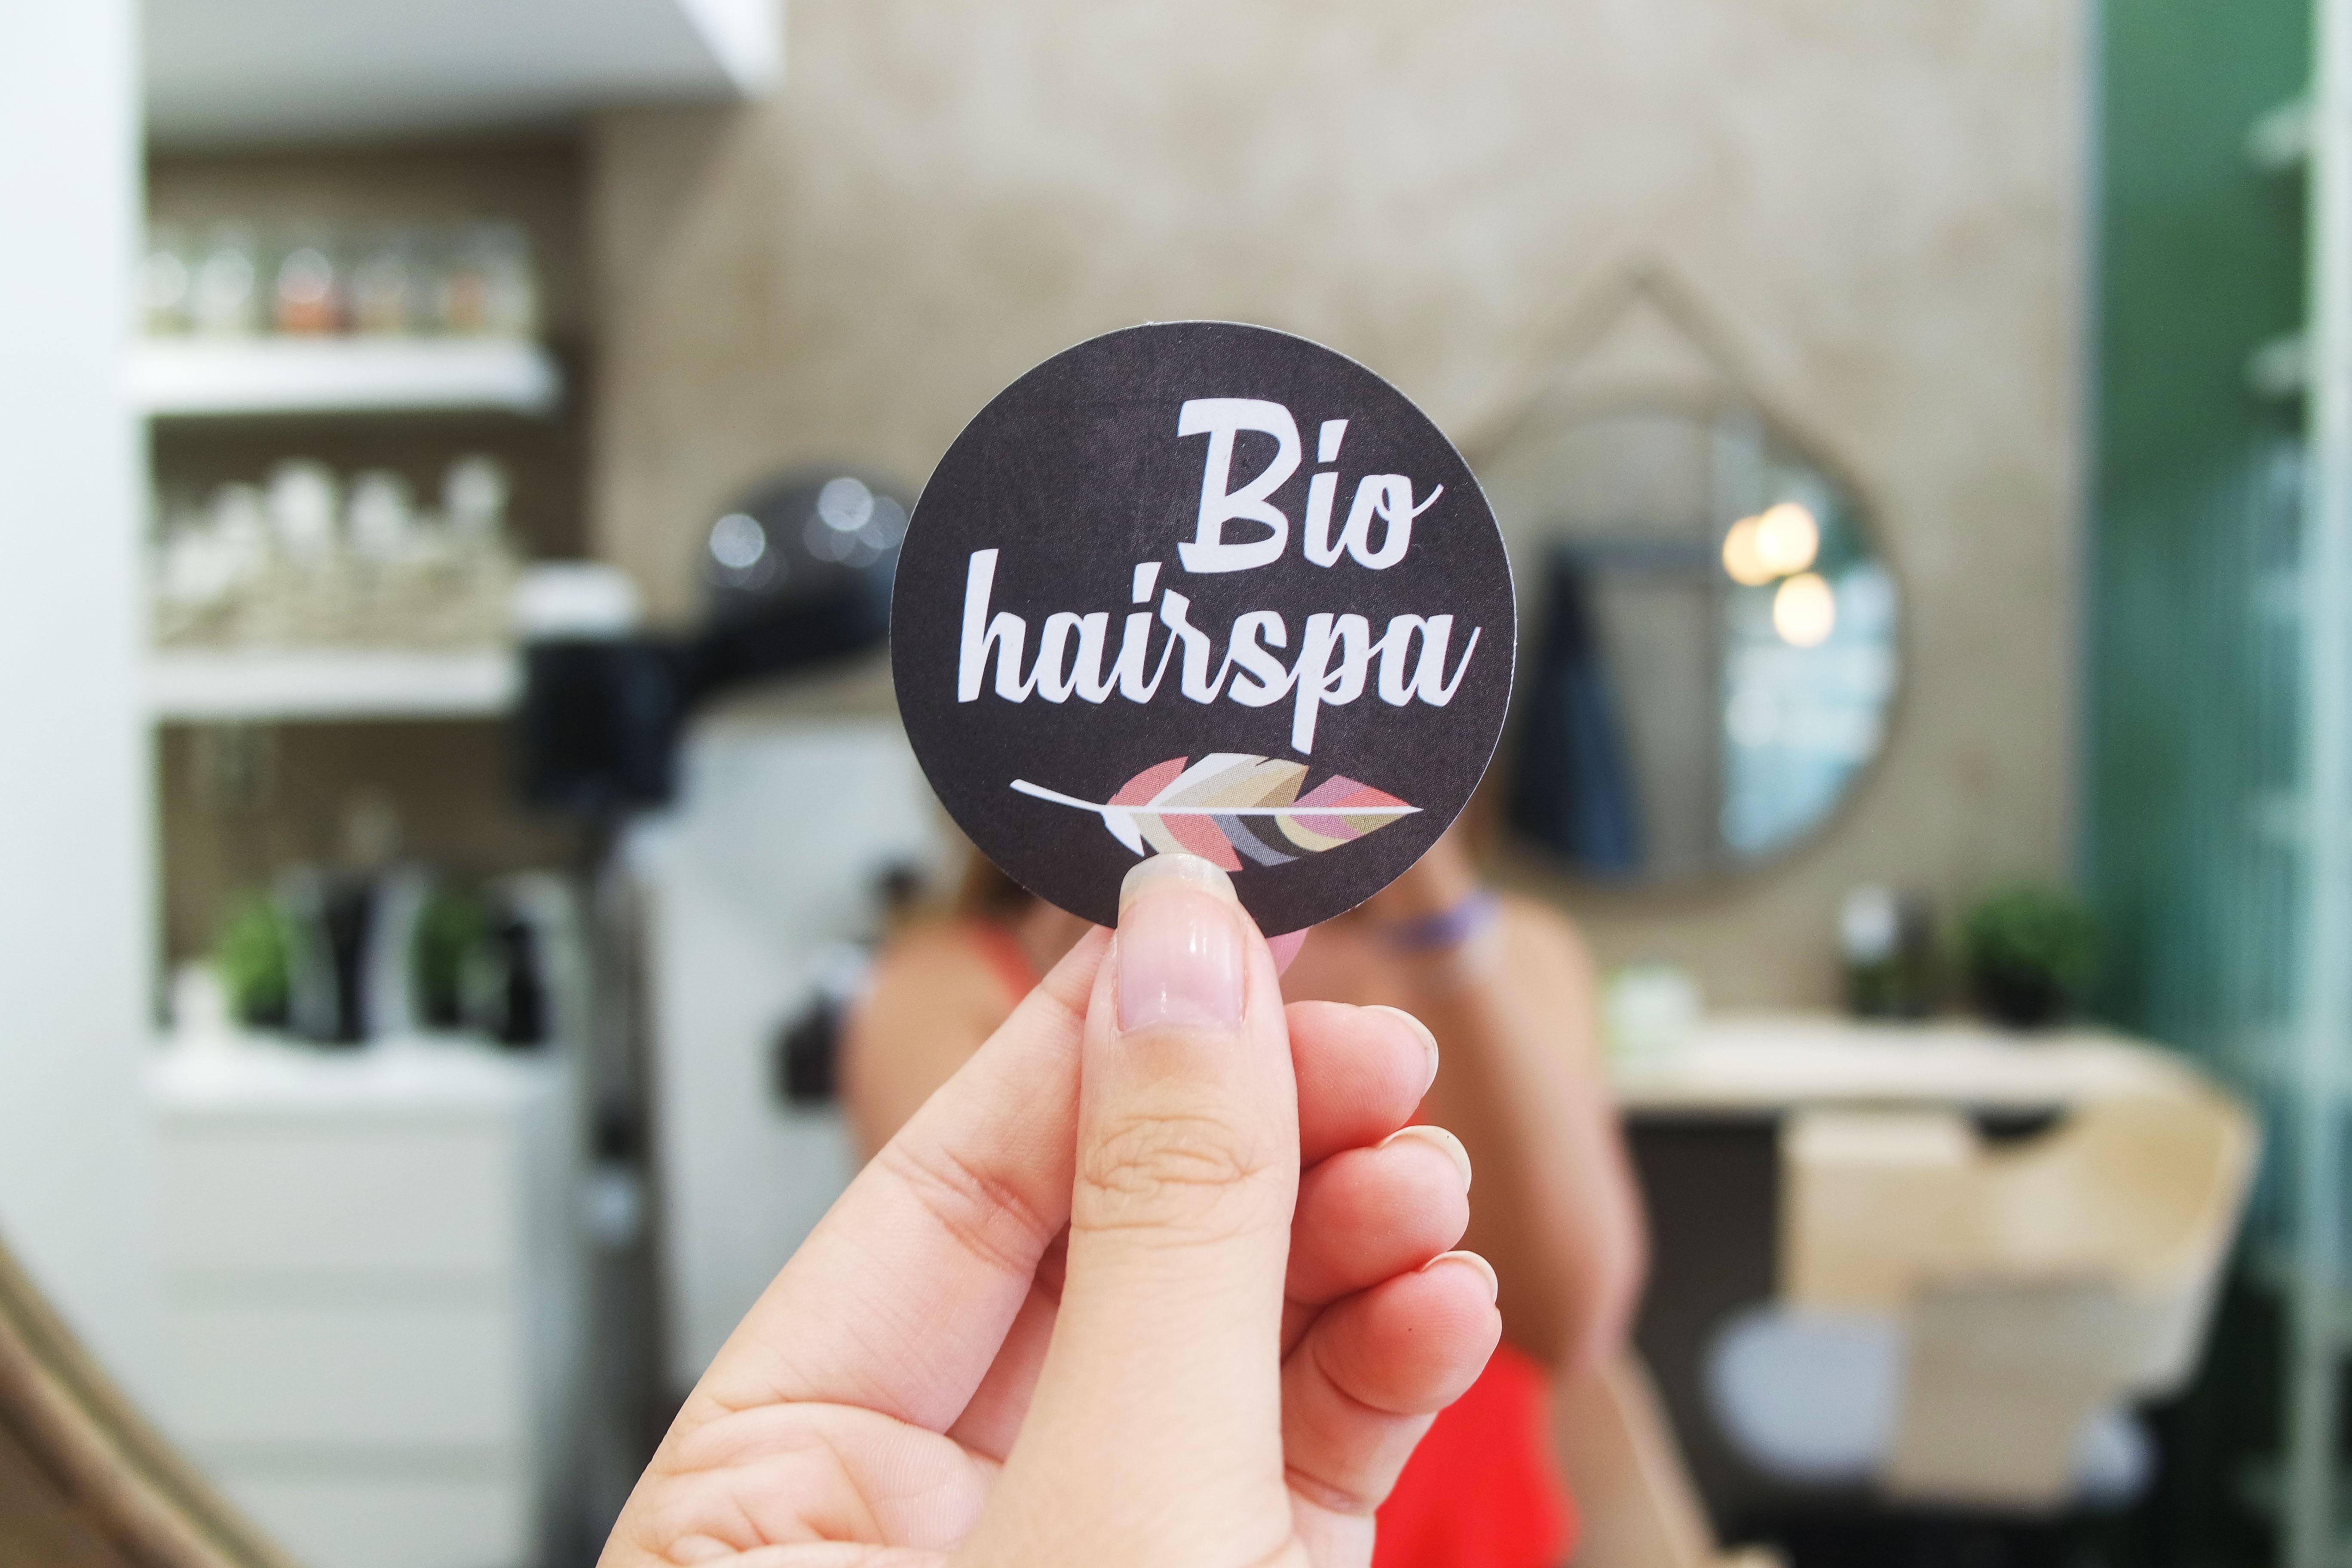 gokan-coiffeur-bio-bruxelles-soin-avis-blog-hair-spa